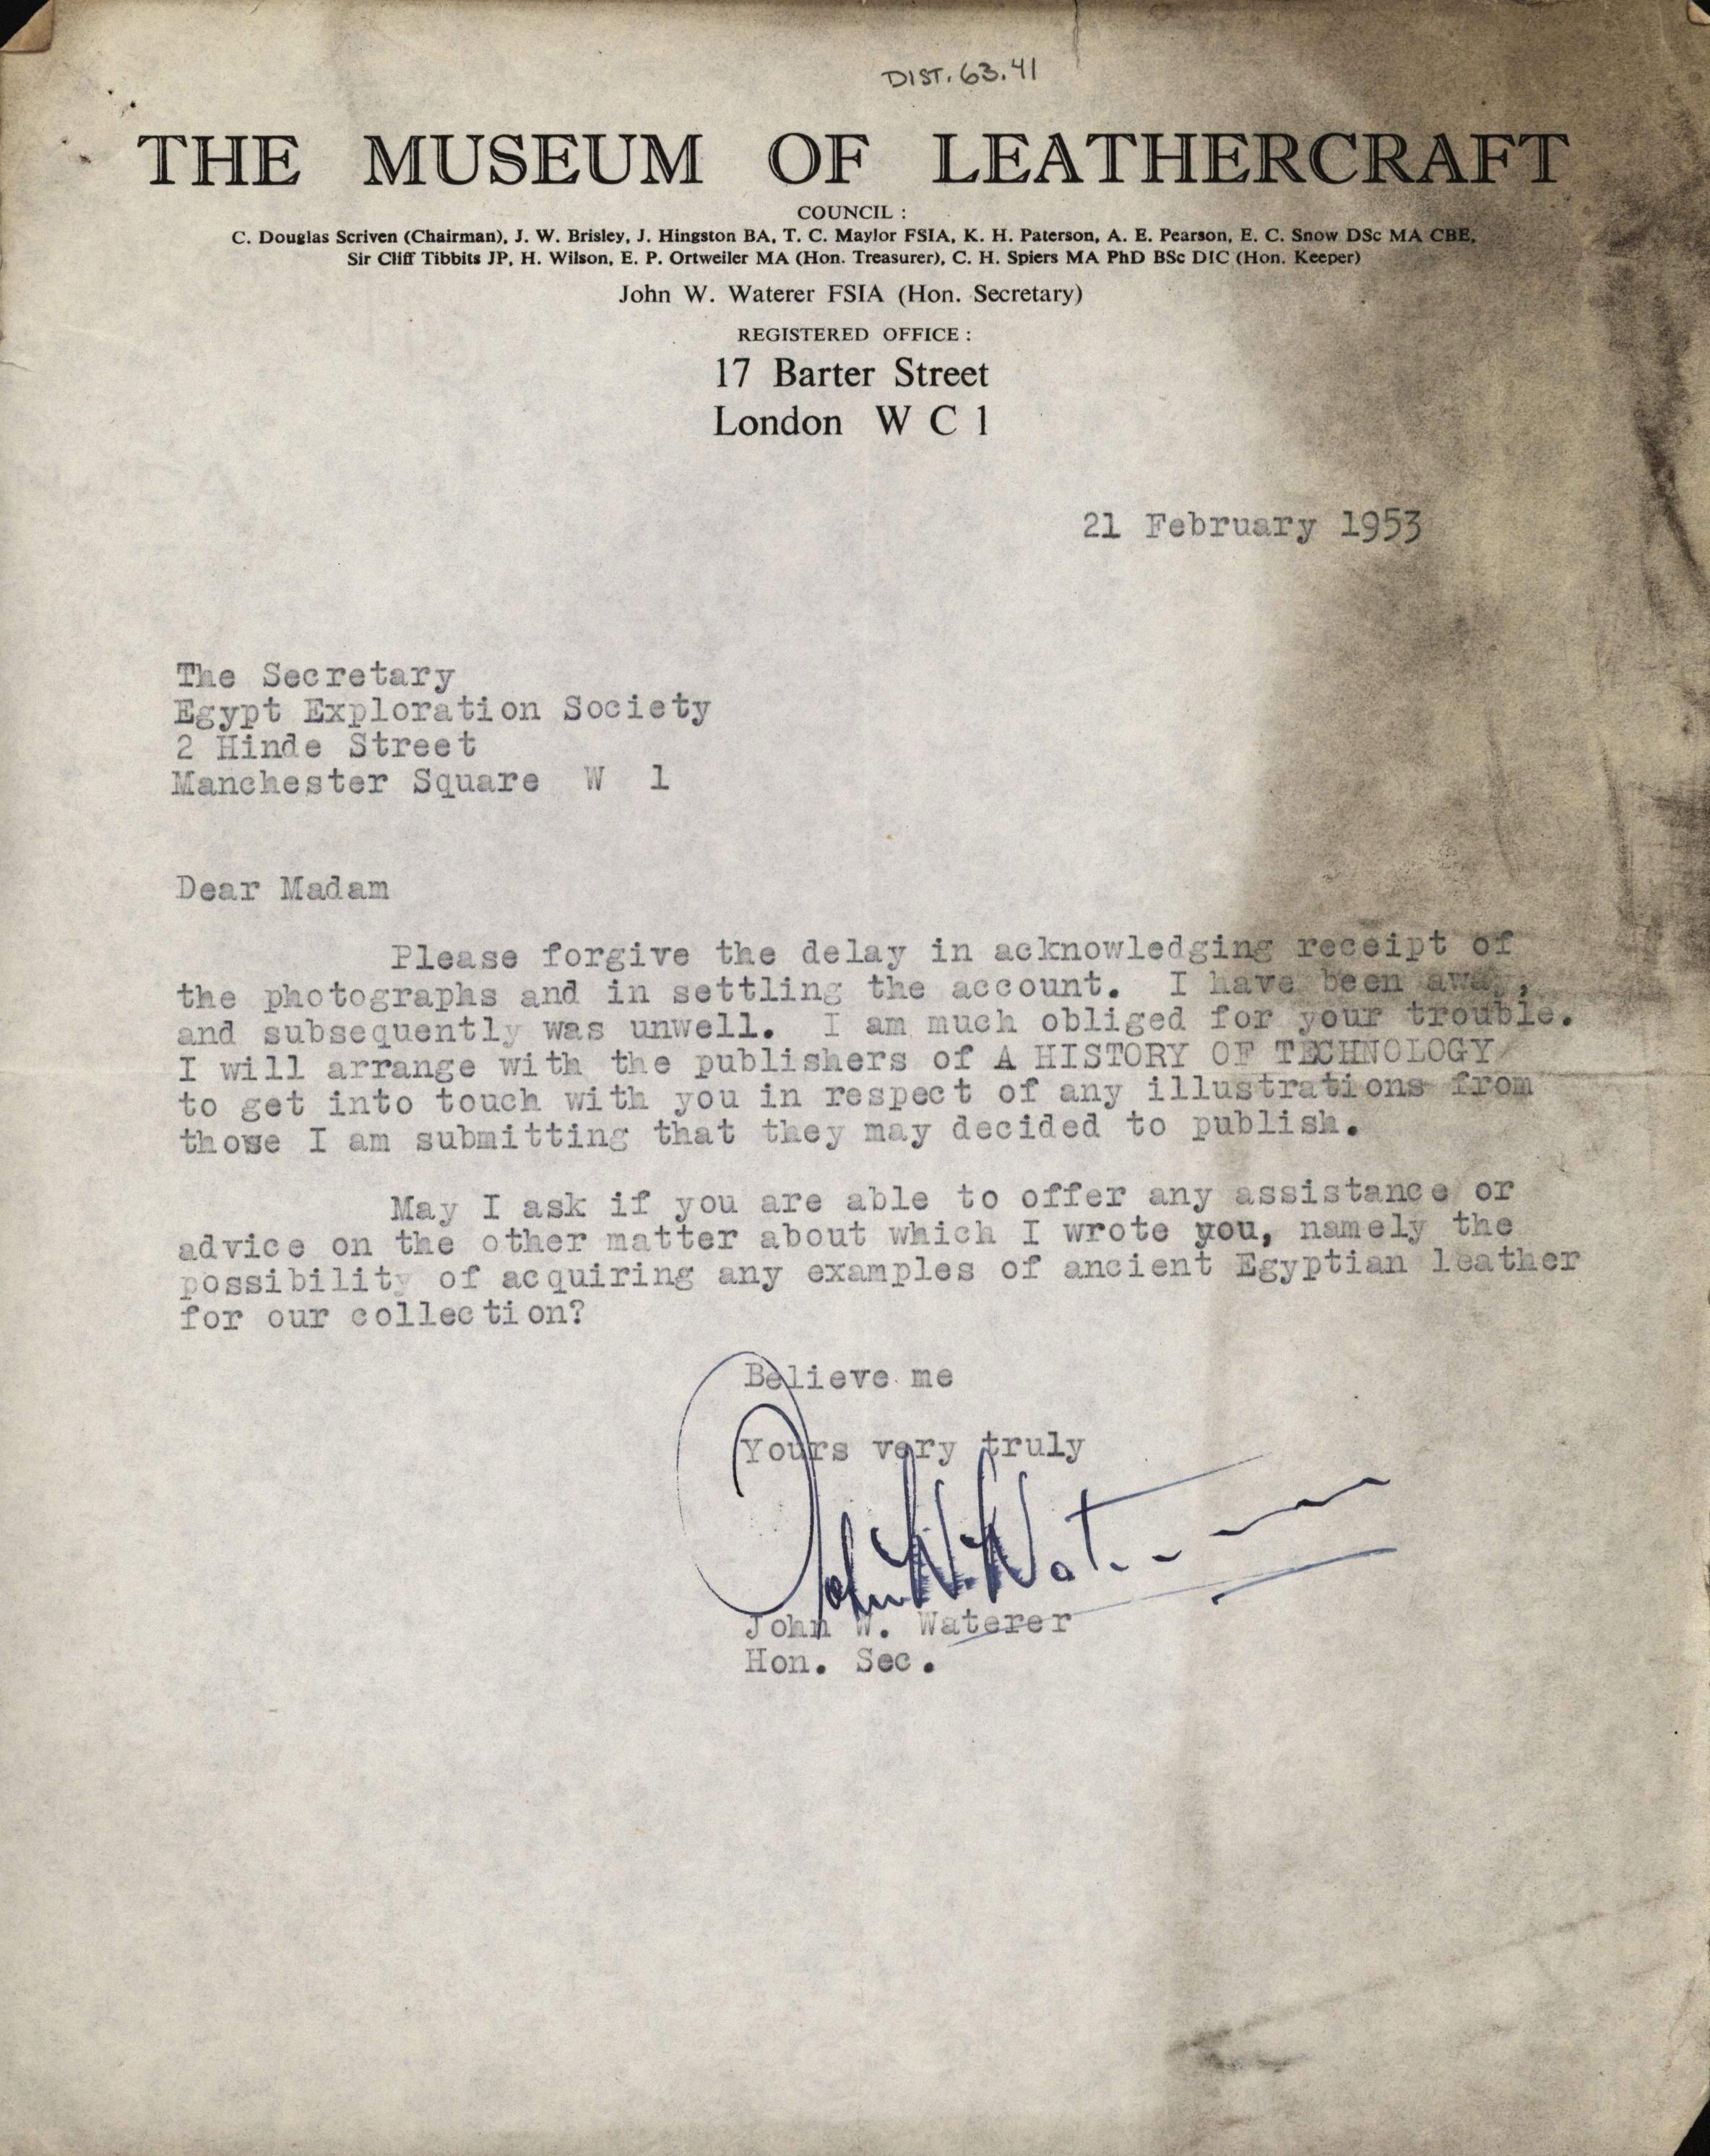 1936-39 Amarah West, Sesebi DIST.63.41